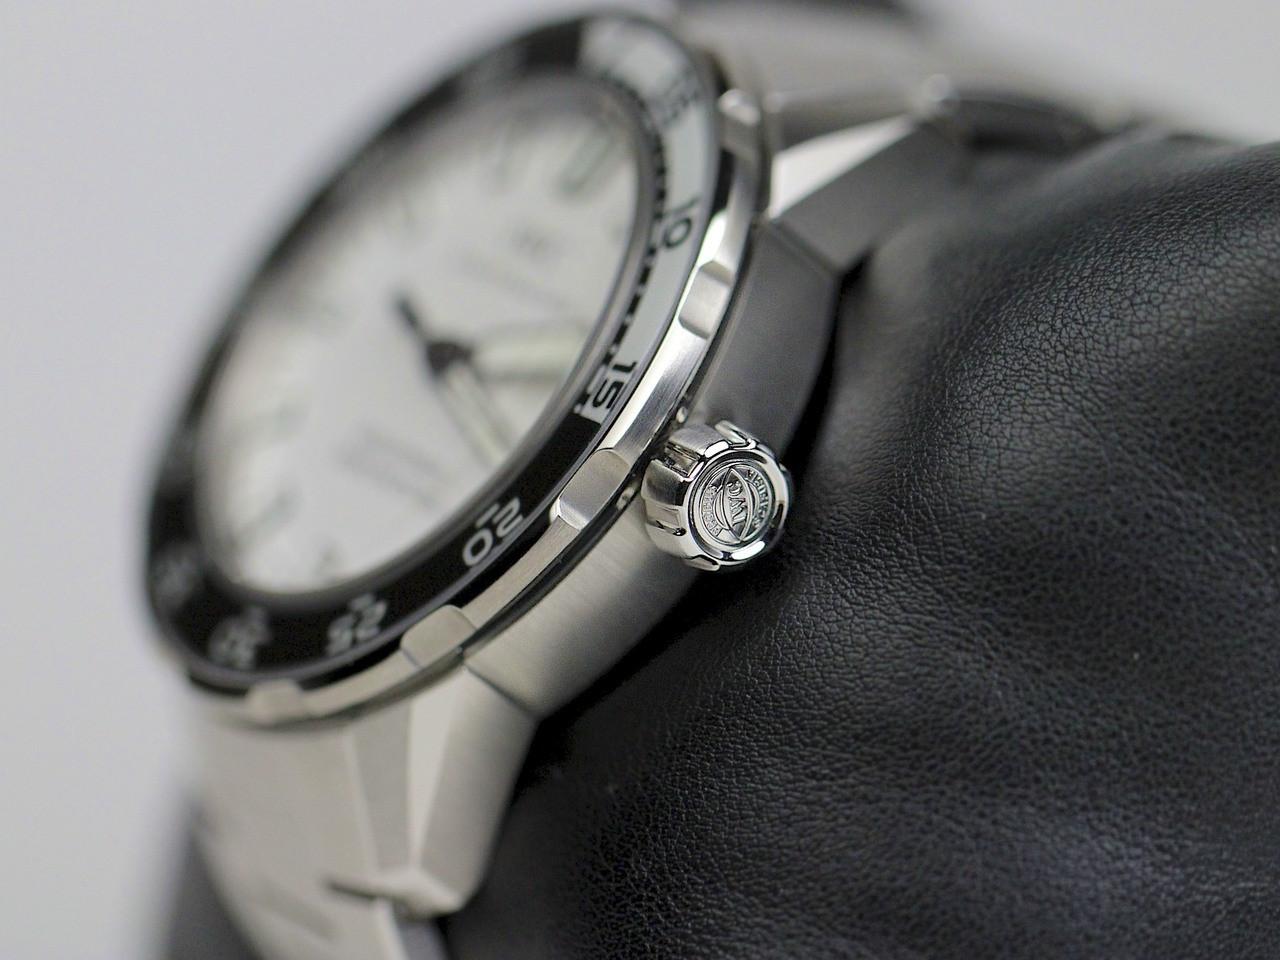 Crown & Case - IWC Watch - Aquatimer 2000 Automatic IW356809 - www.Legendoftime.com - Chicago Watch Center